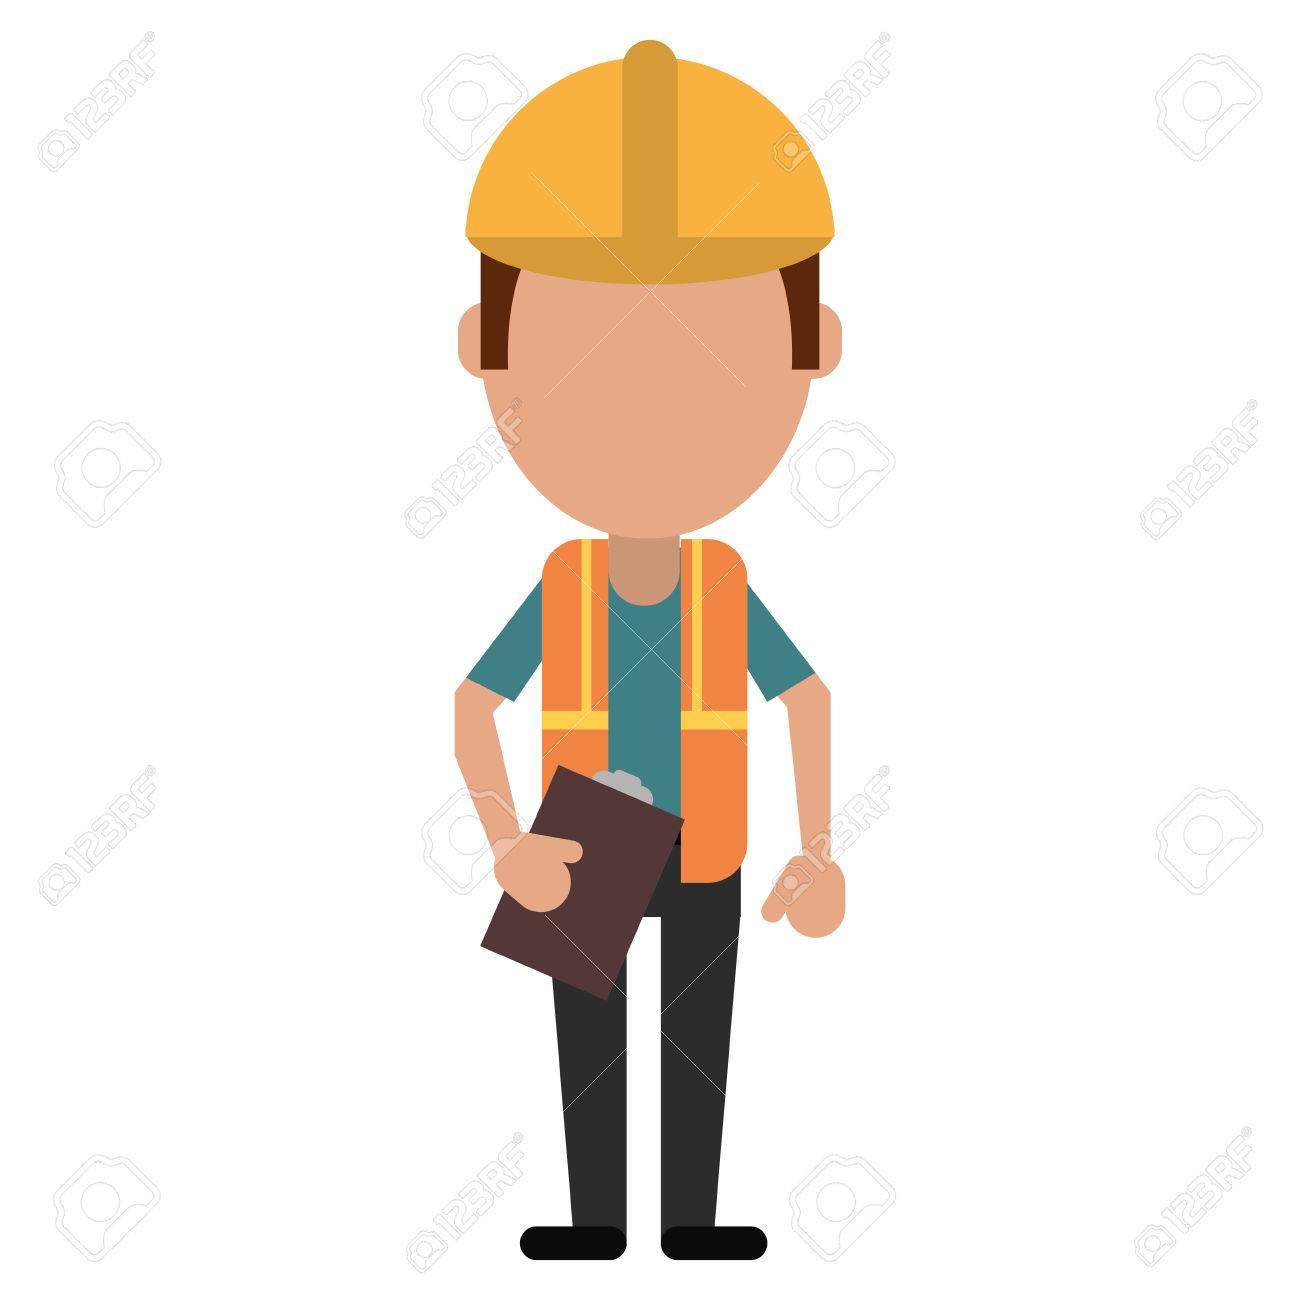 Foreman Construction Helmet Vest And Clipboard Vector Illustration Stock